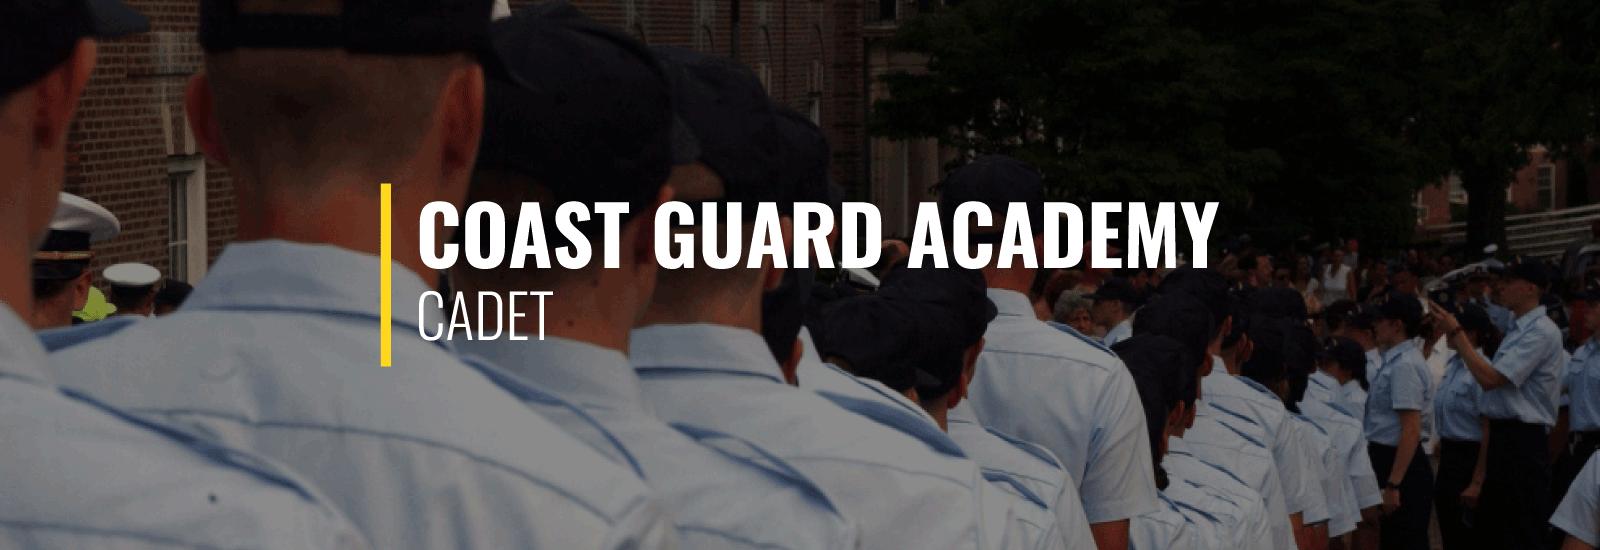 Coast Guard Academy Cadets